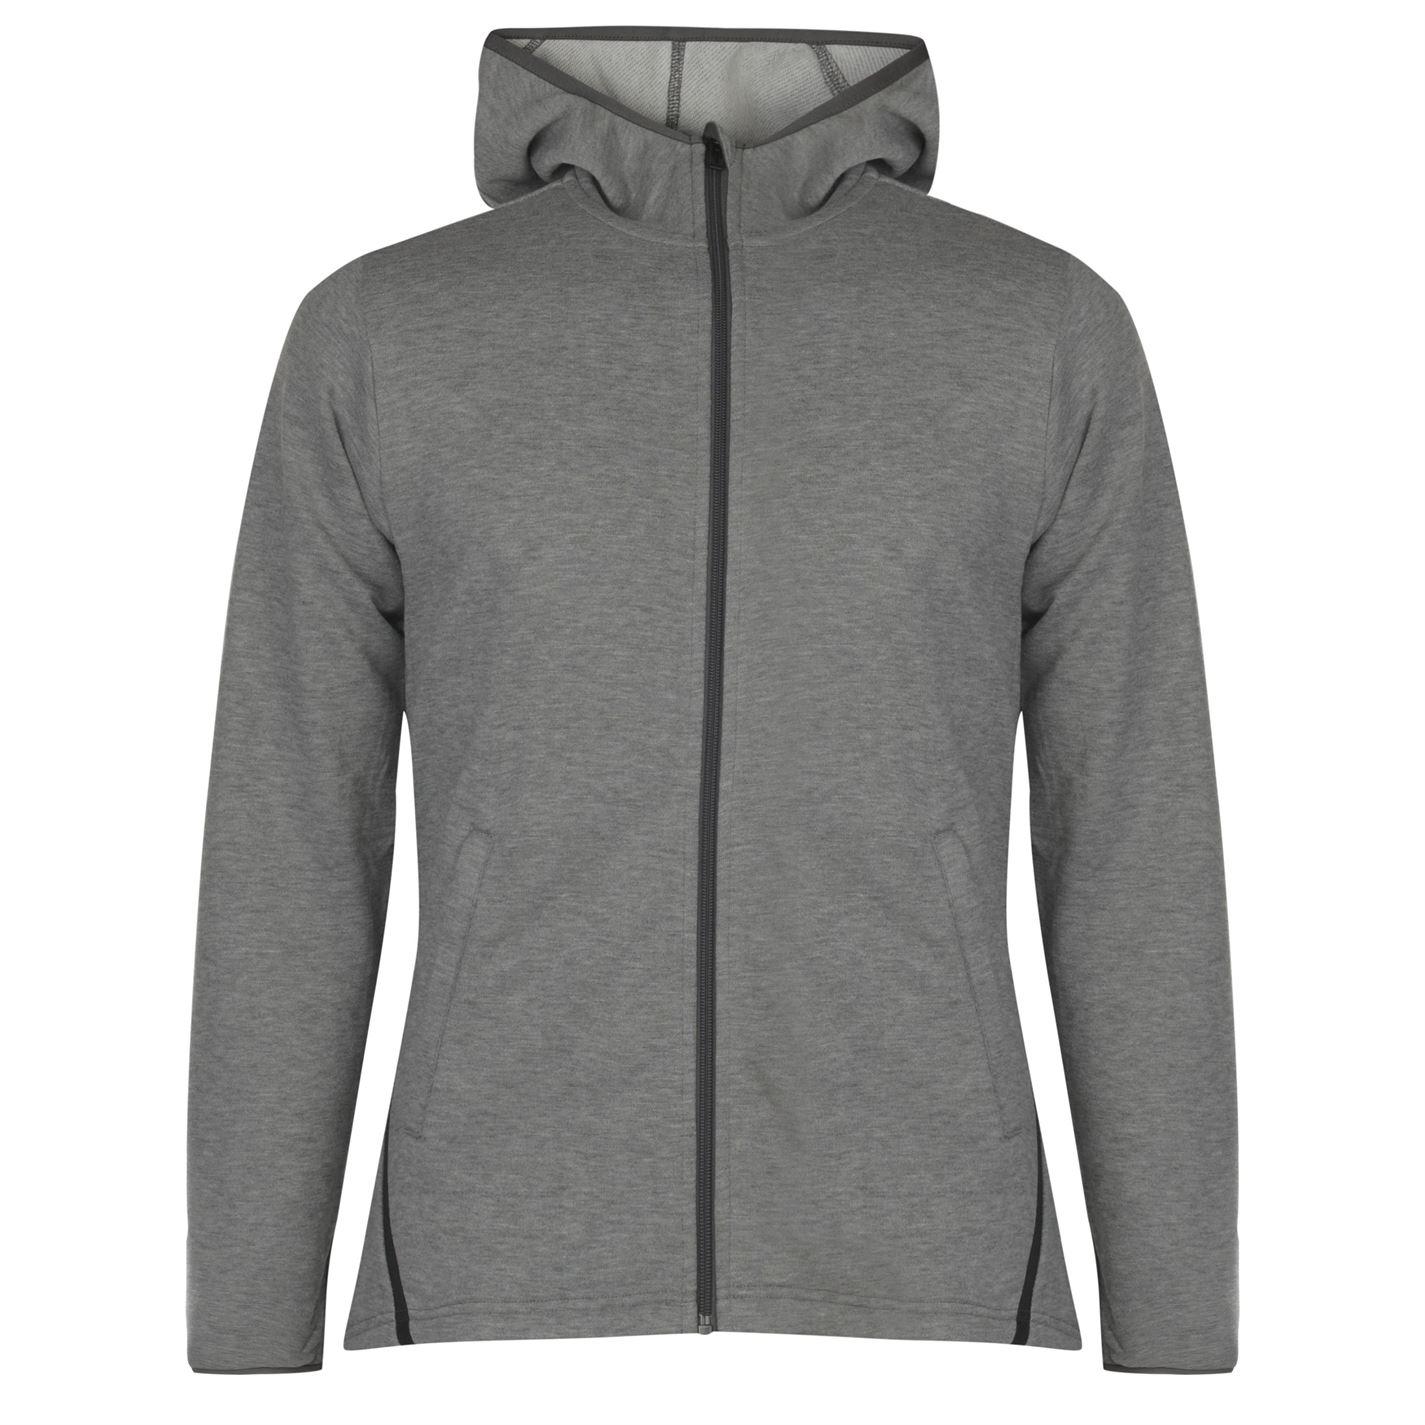 Adidas Full Zip Training Hoody Mens